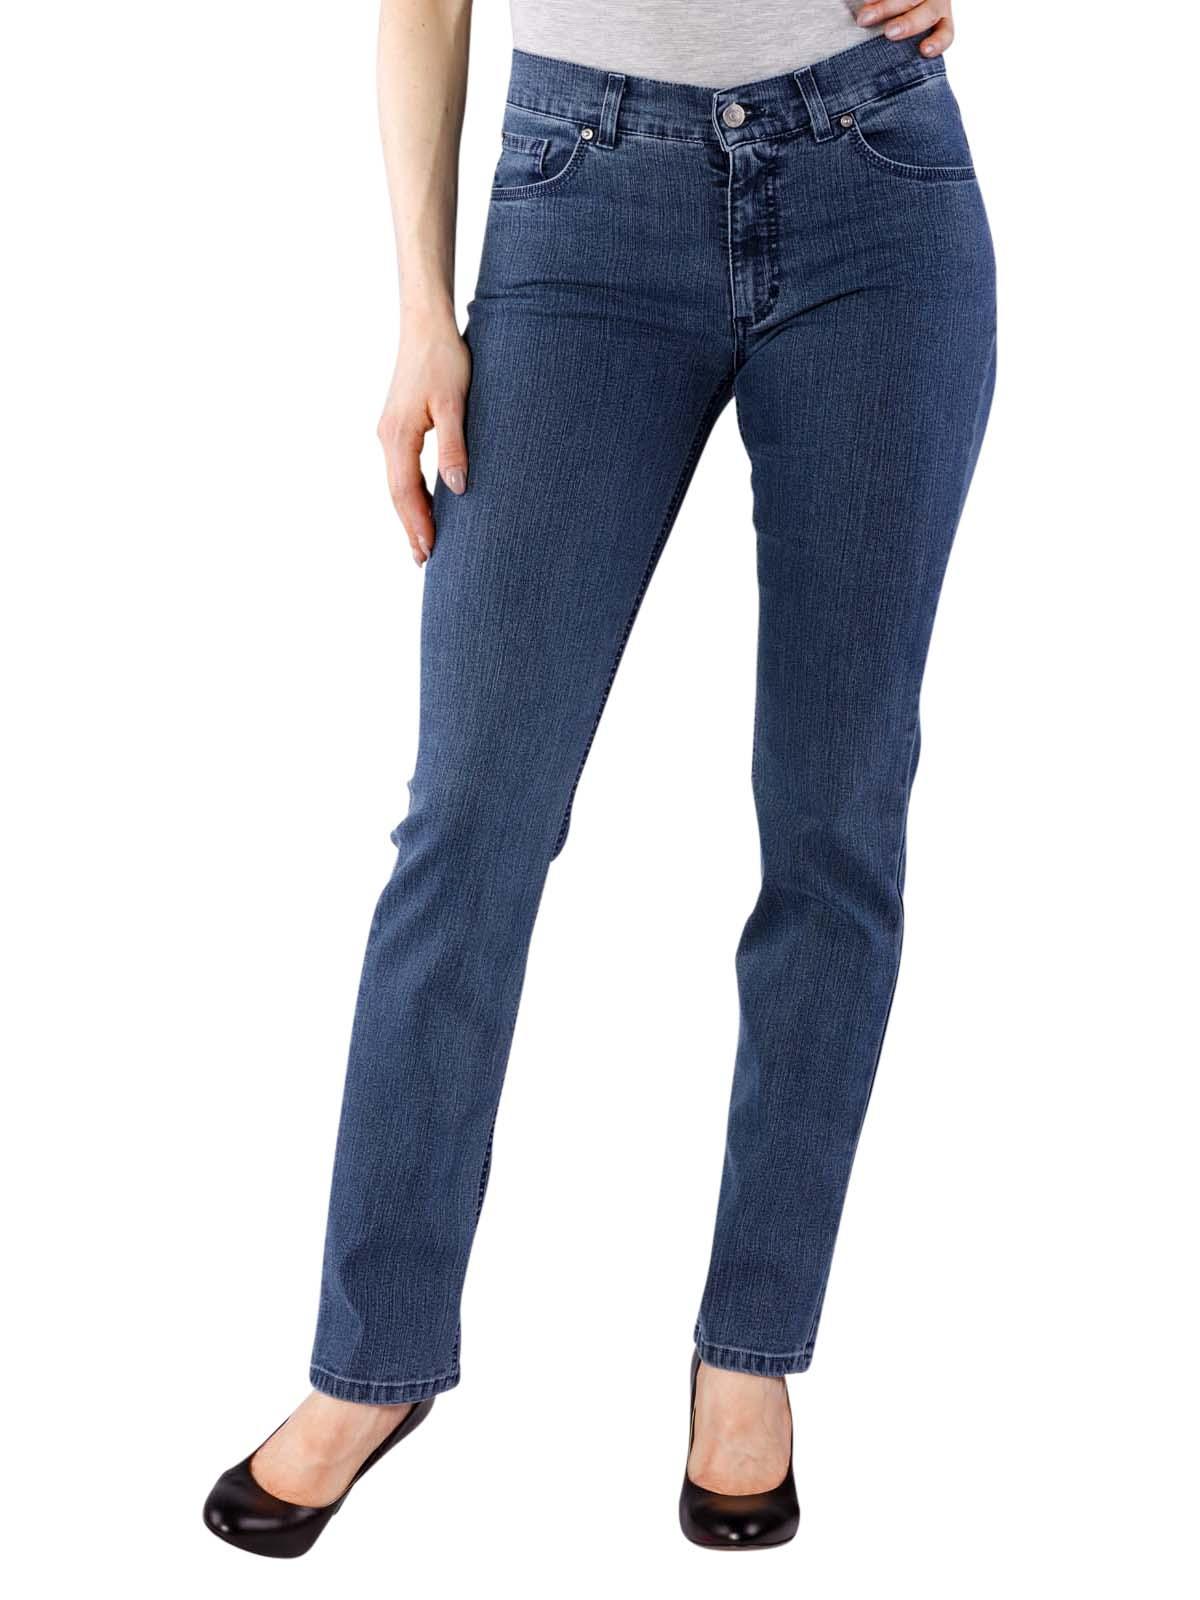 ANGELS Skinny modische Damen Röhren-Jeans in Blue Denim Stretch